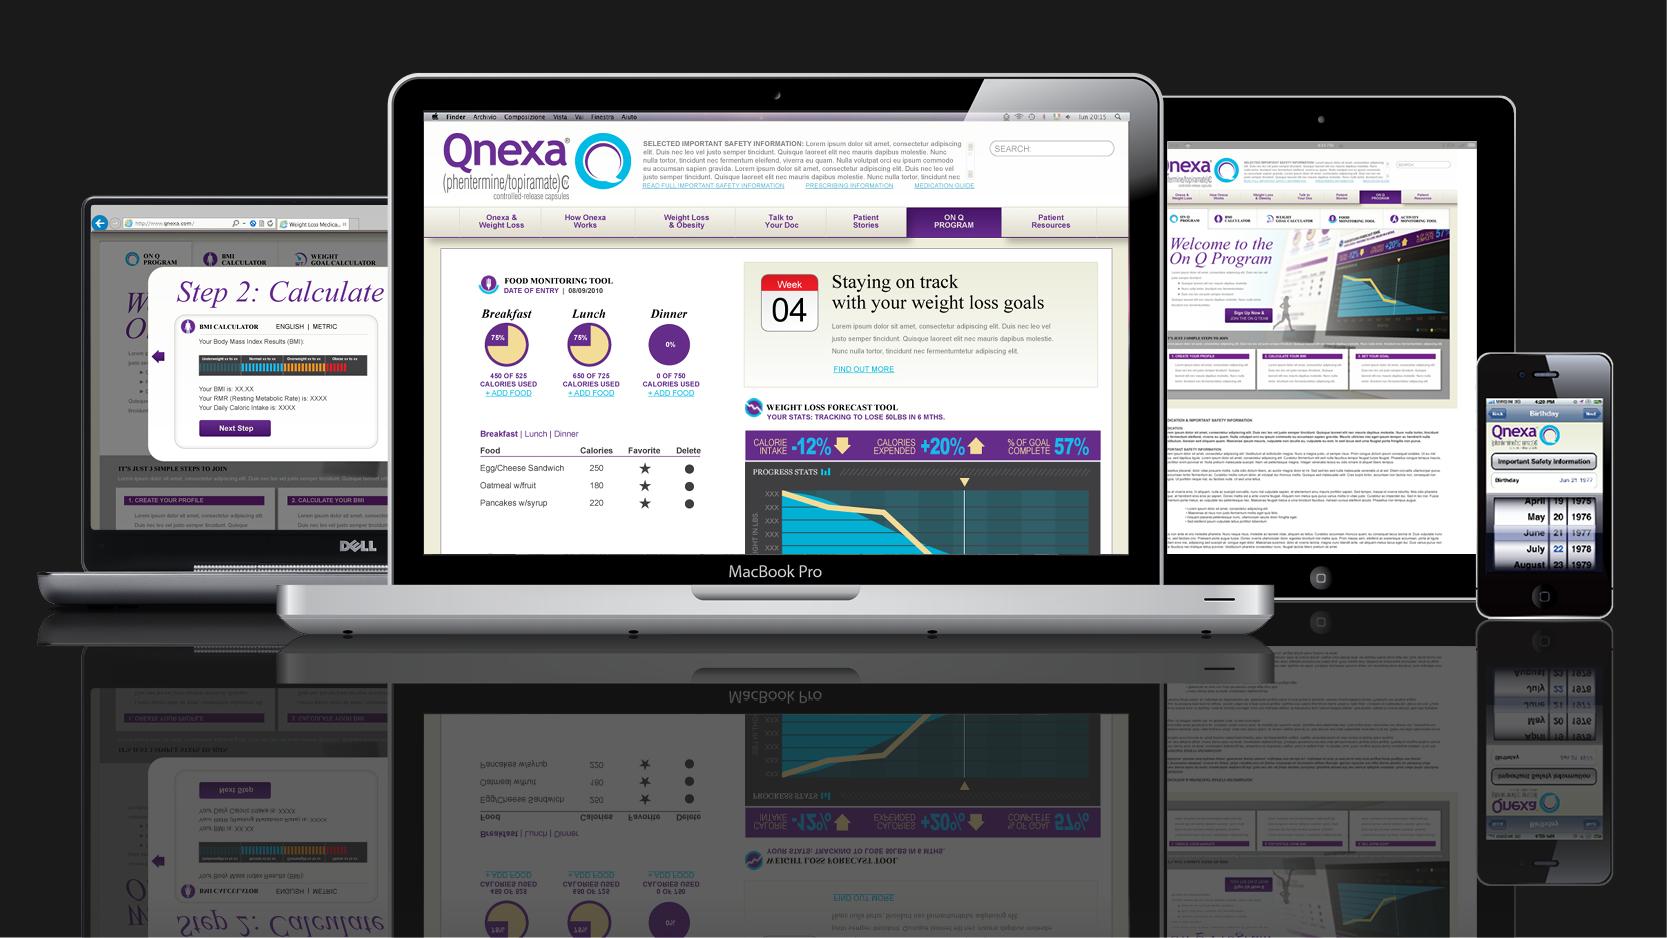 Vivus Qnexa Responsive Web Design